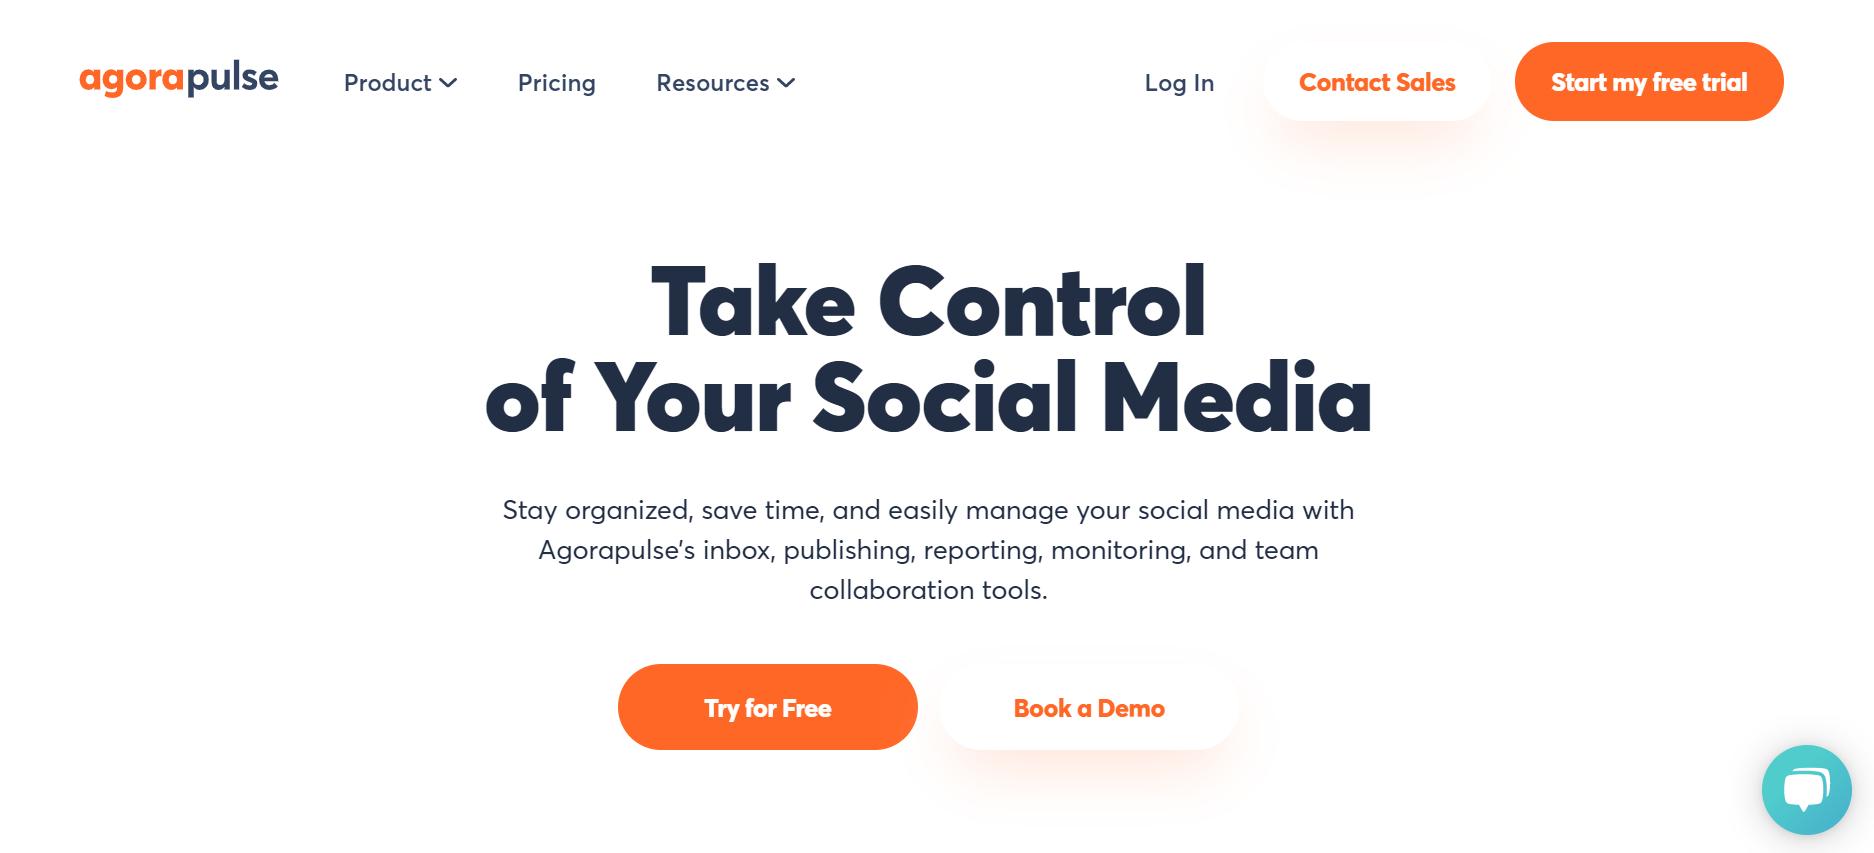 Agorapulse-social-media-marketing-tools